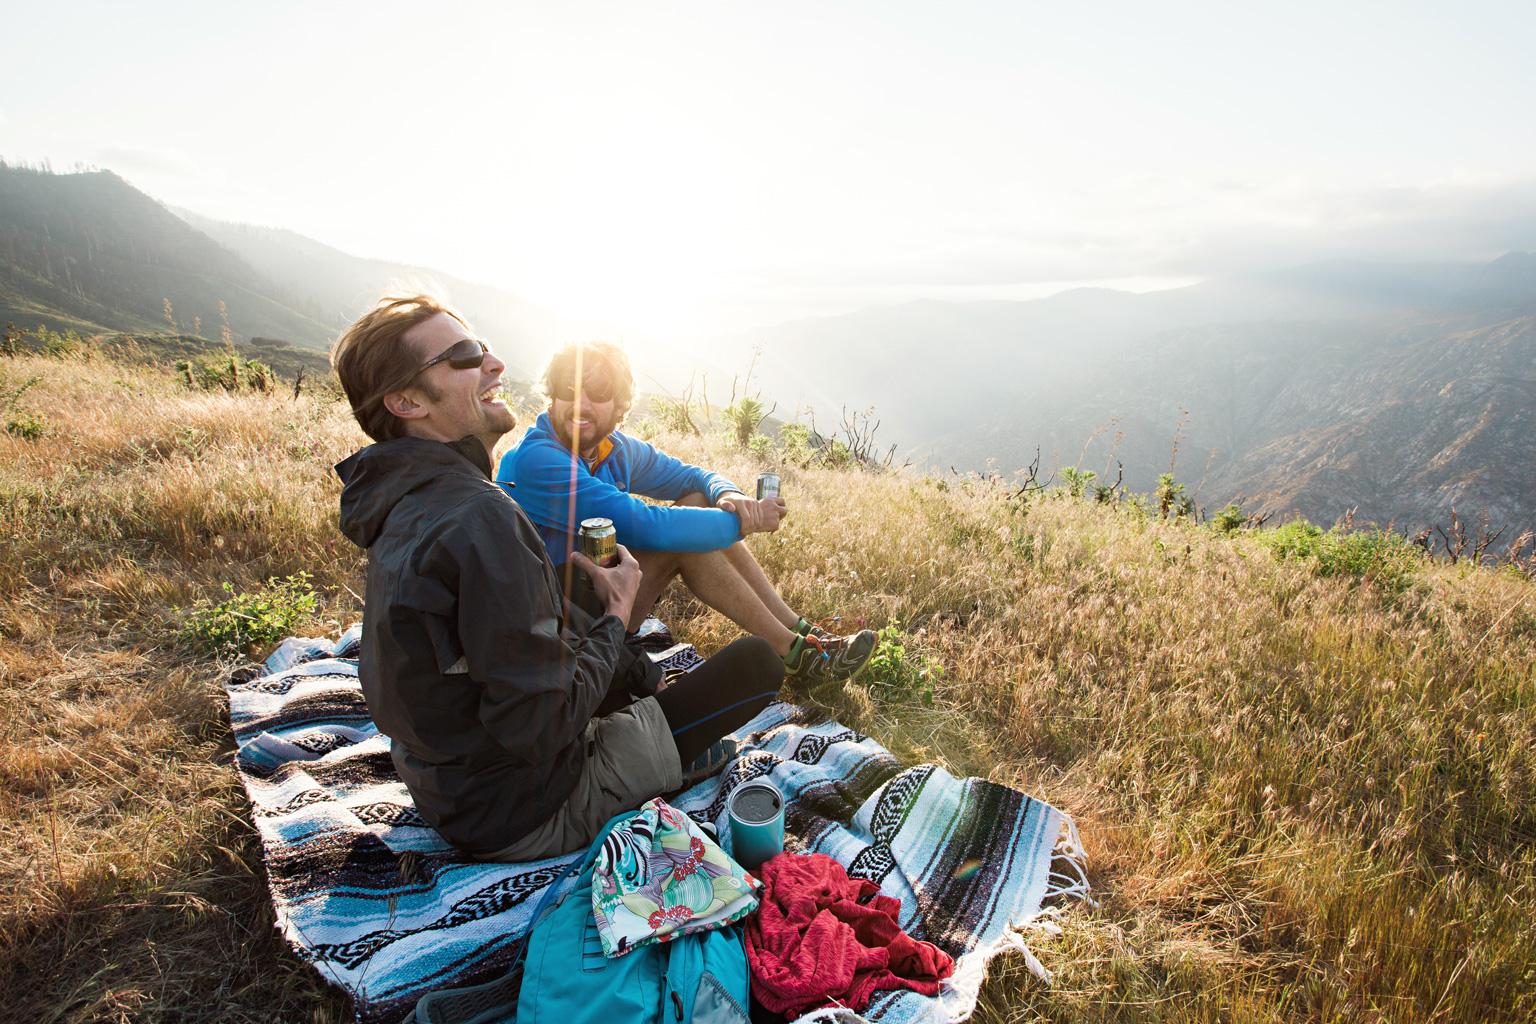 CindyGiovagnoli_Kings_Canyon_National_Park_hike_firetower_lookout_sunset-013.jpg